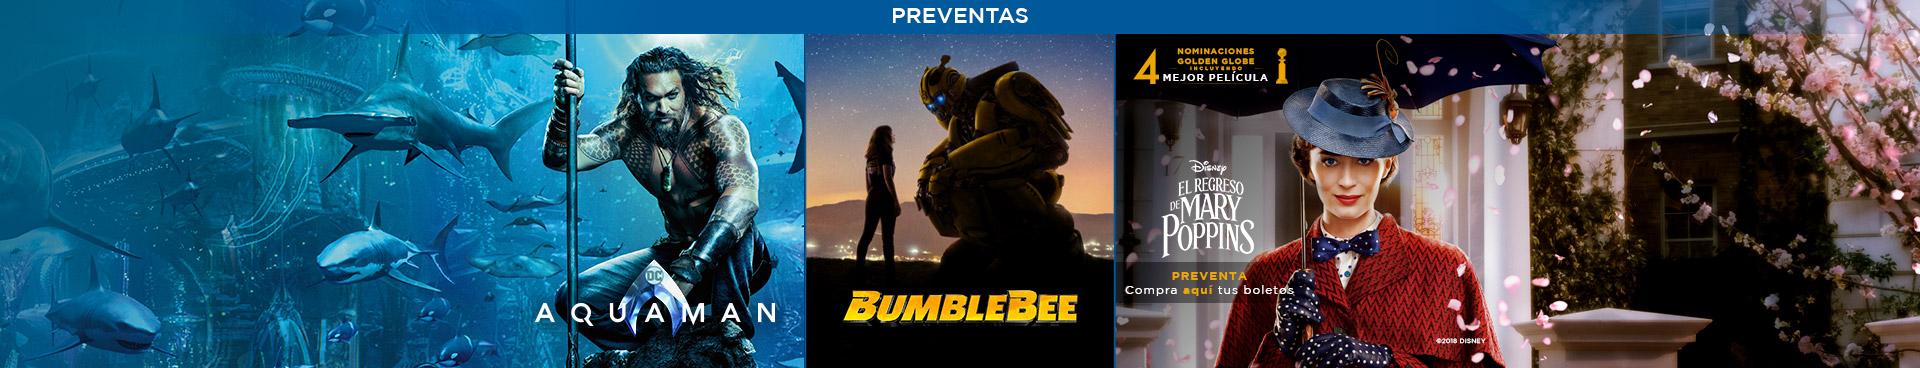 Preventas (Aquaman / Bummblebee / Mary Poppins)